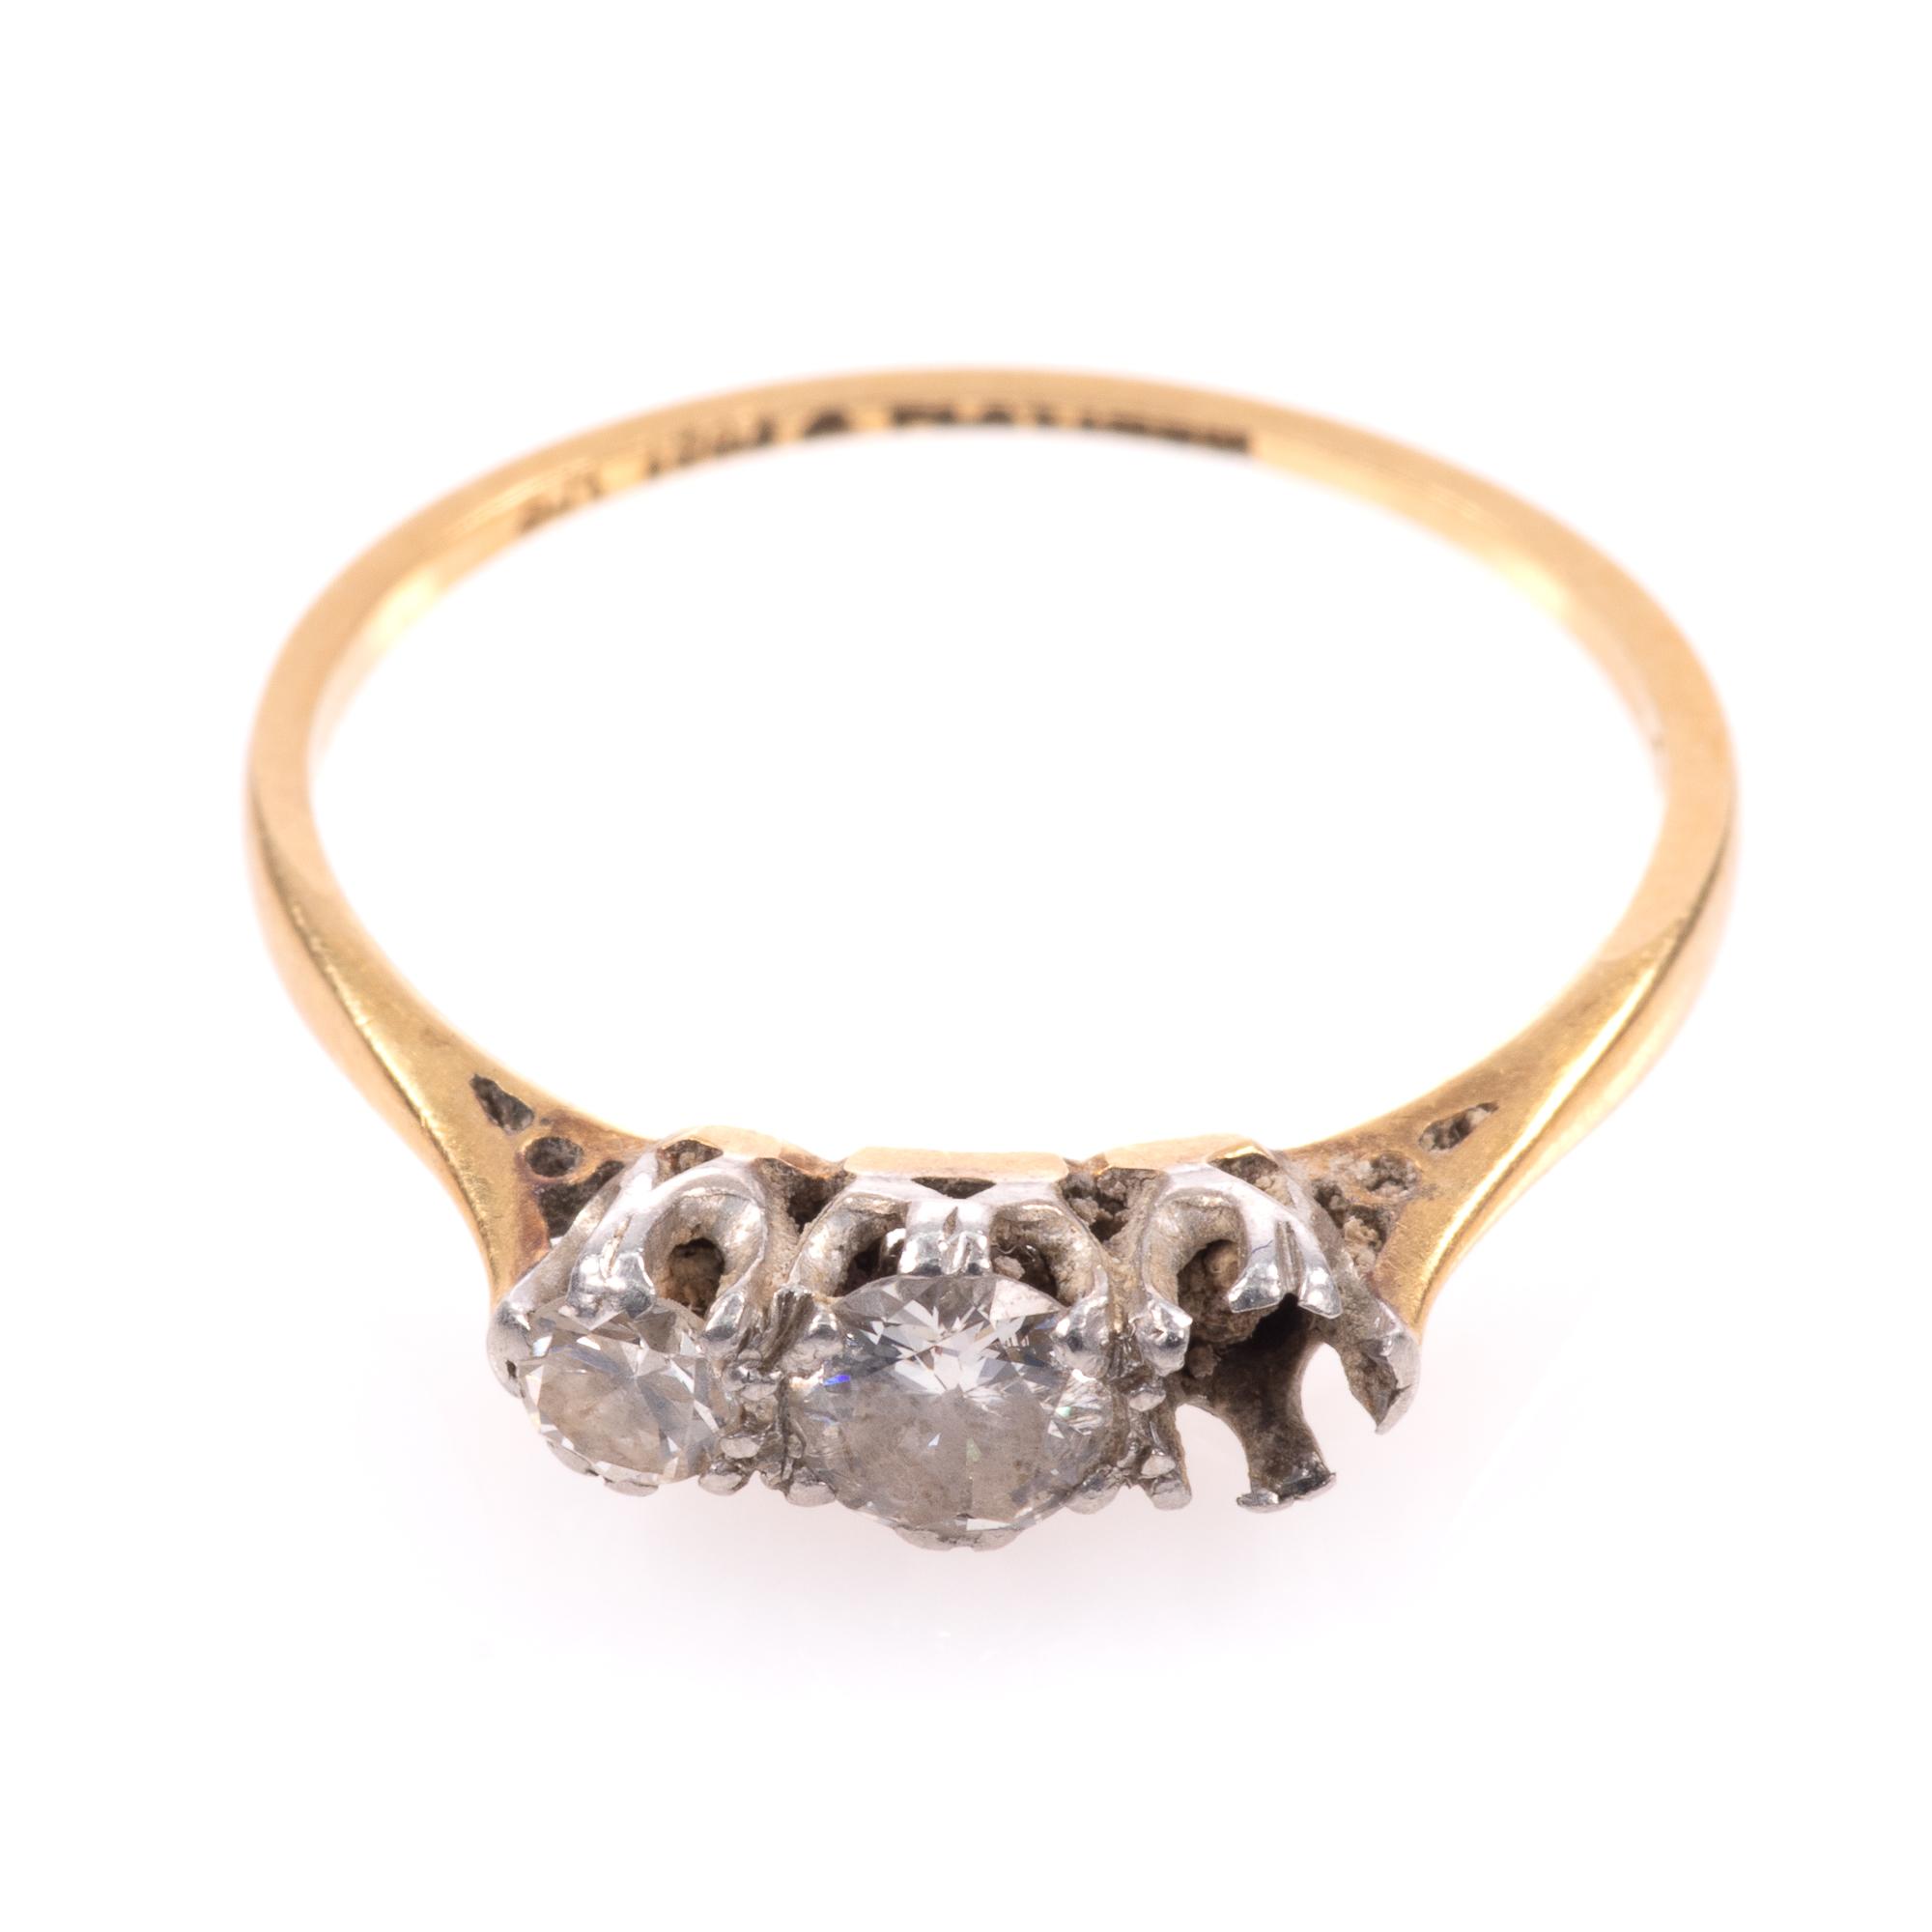 18ct Gold & Platinum 0.40ct Diamond Ring - Image 3 of 8